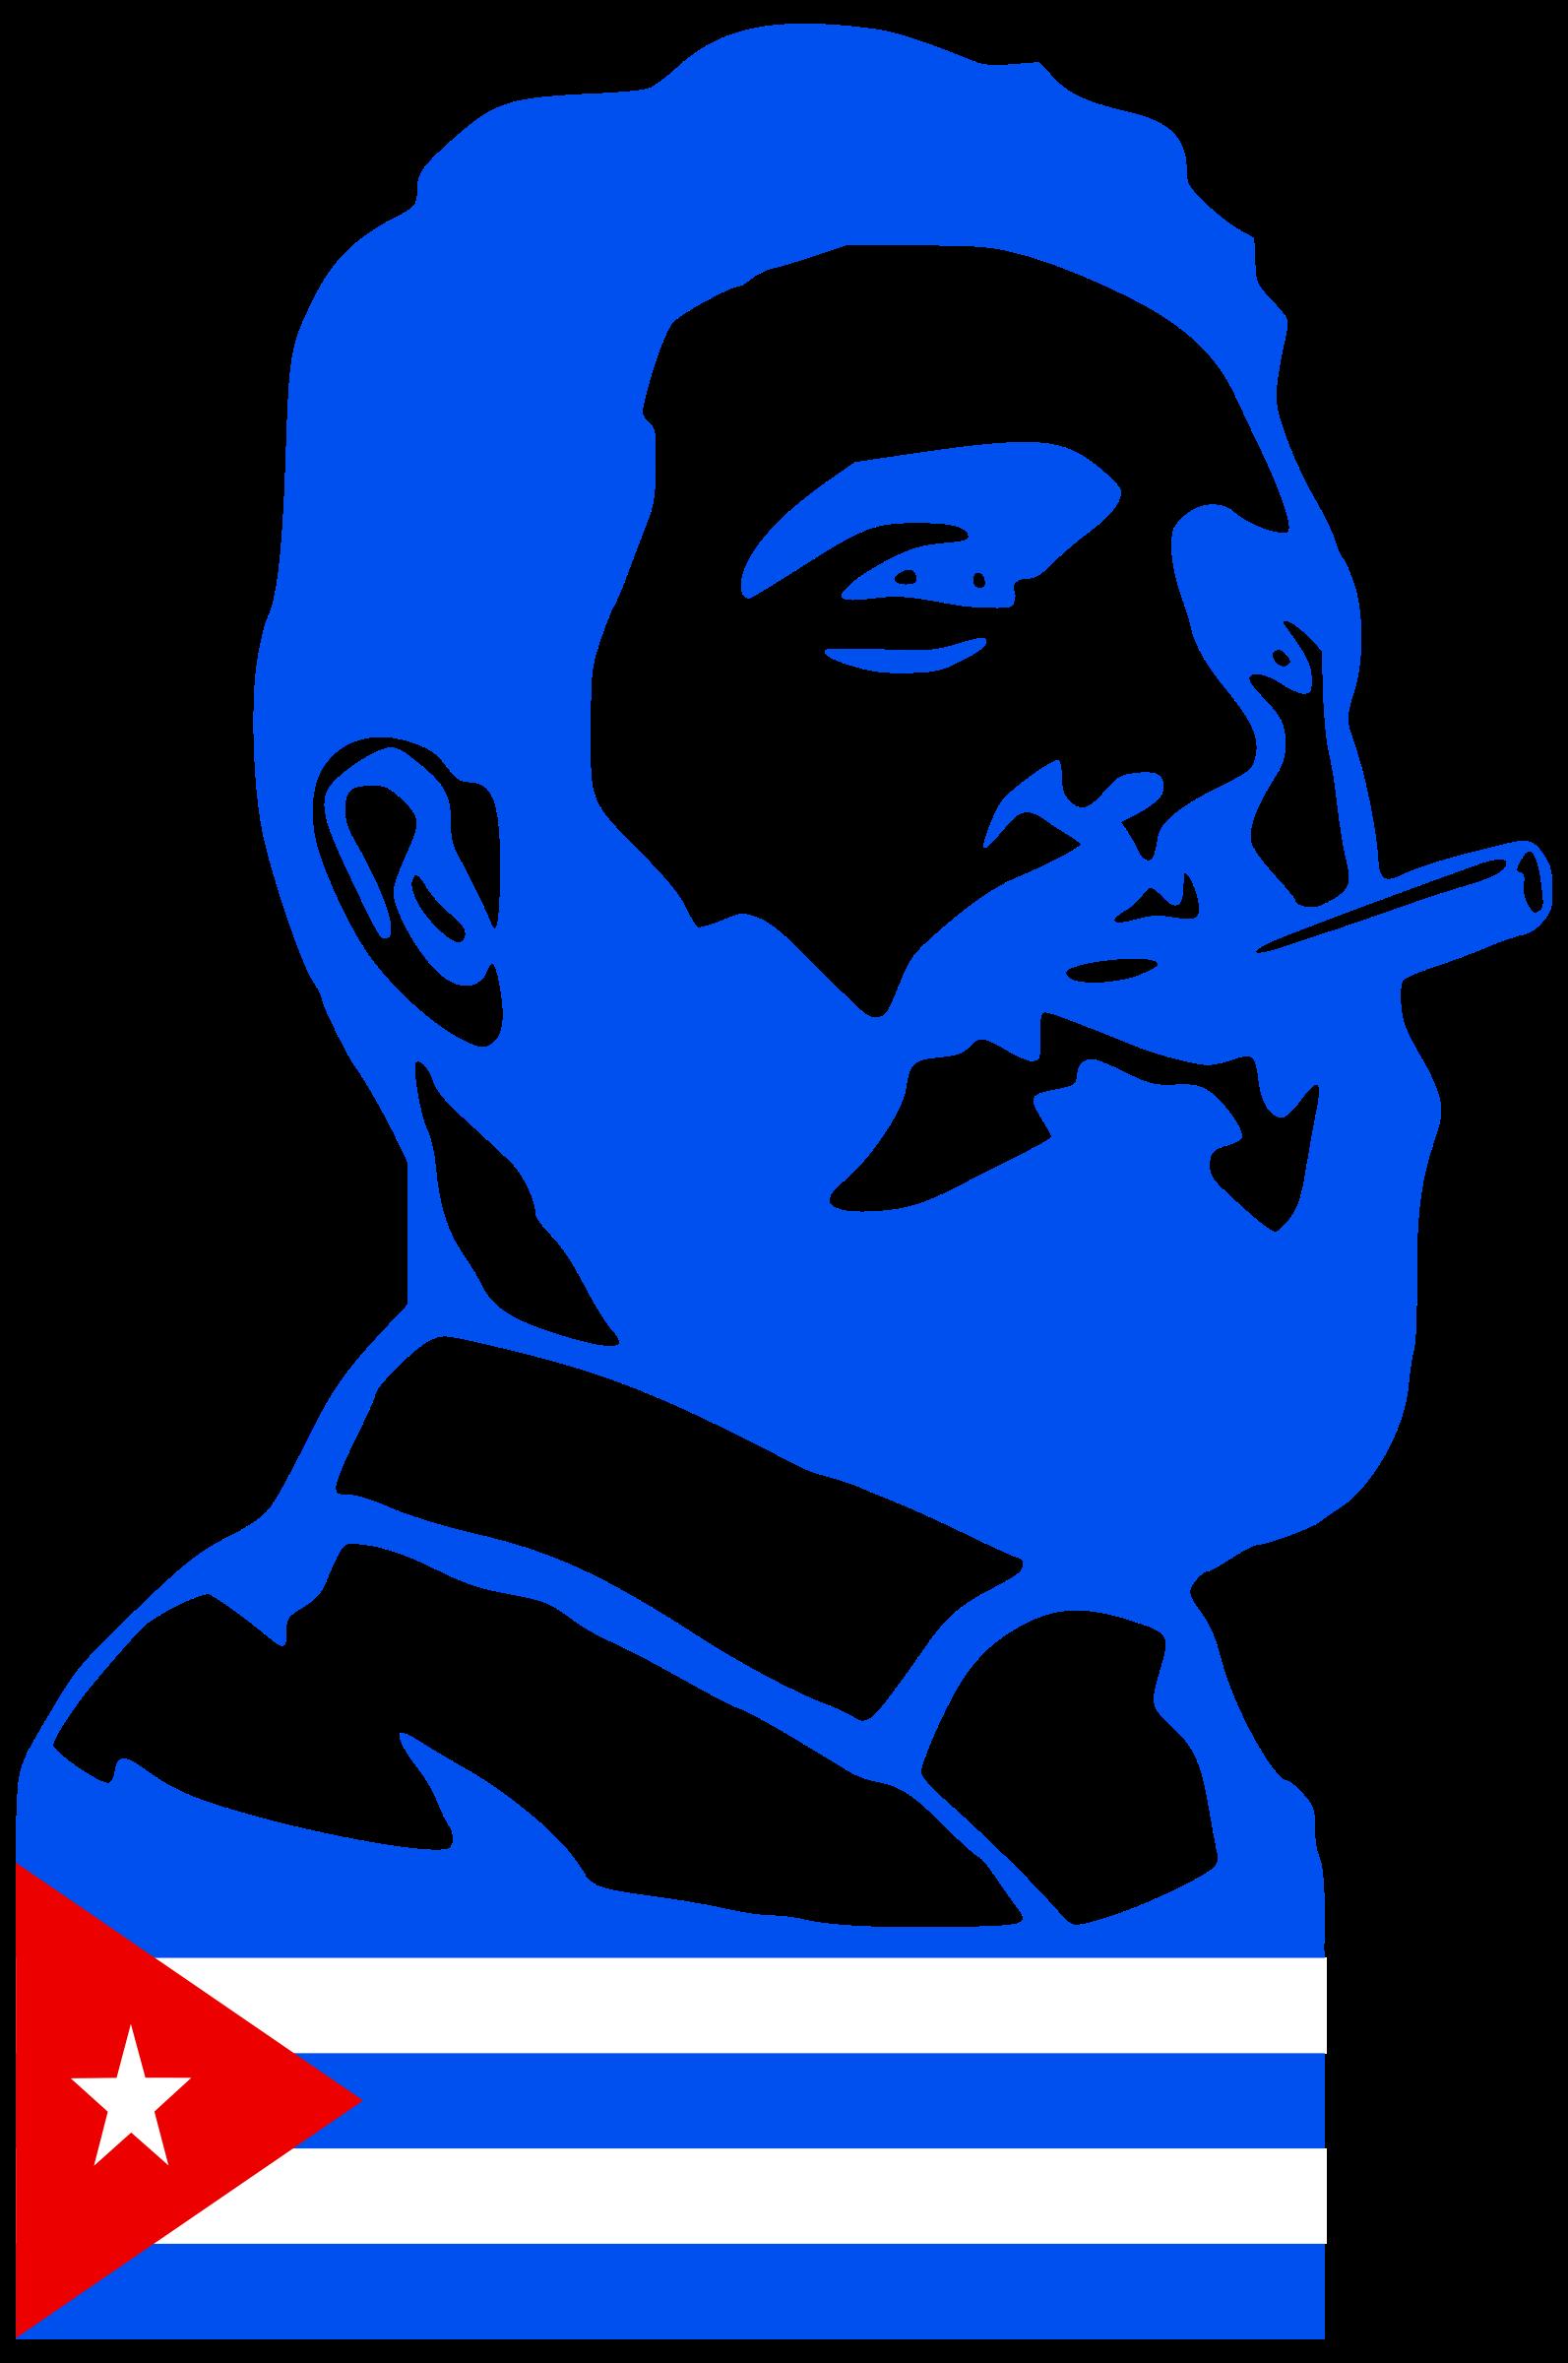 Free Cuba Cliparts, Download Free Clip Art, Free Clip Art on.